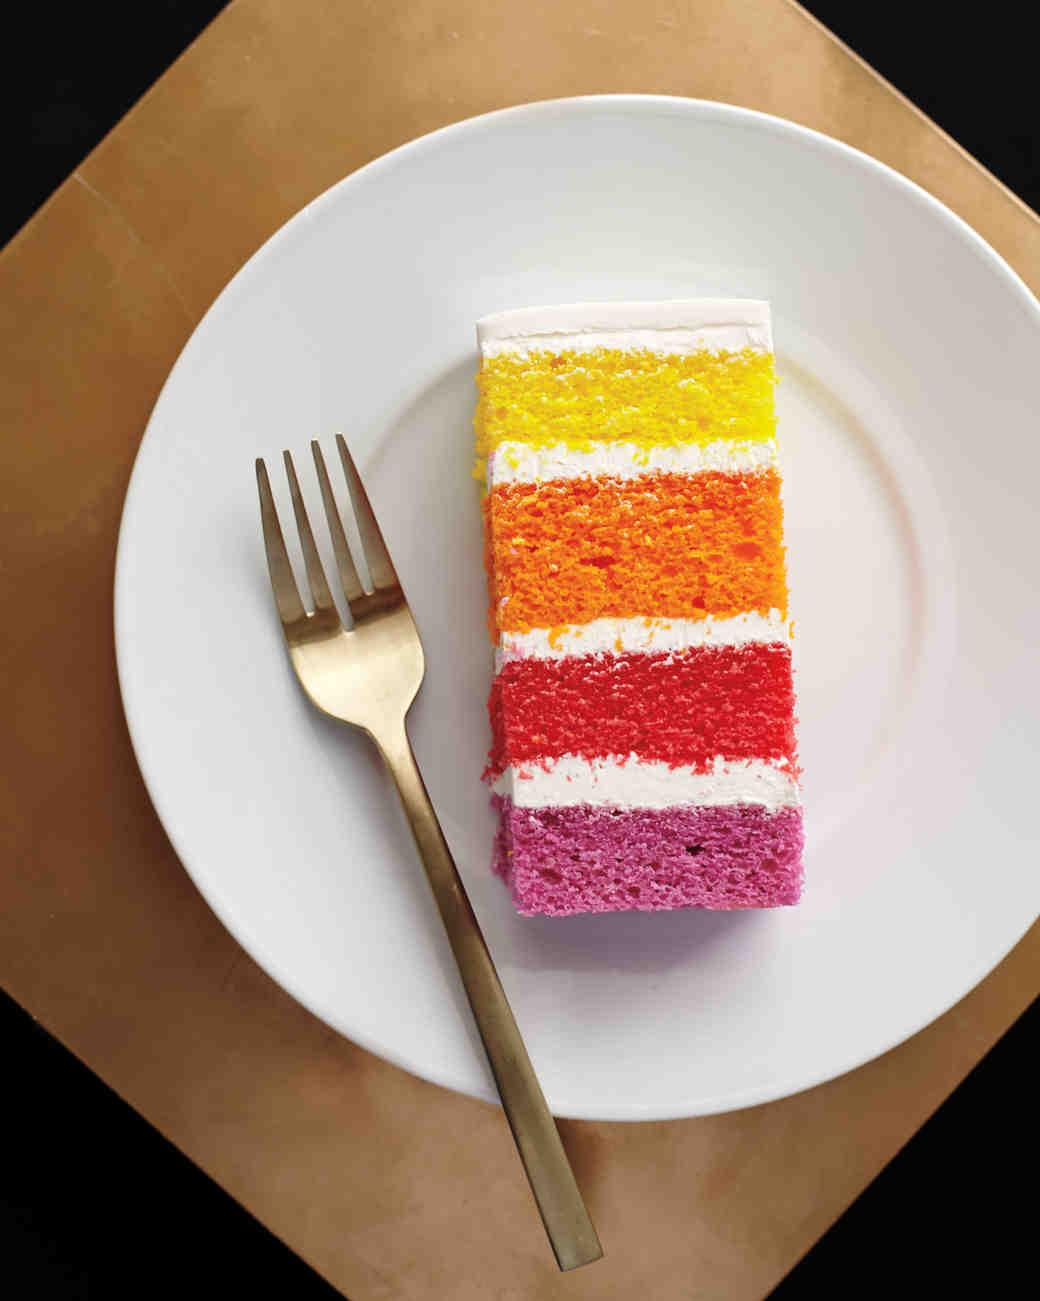 ombré cake layers